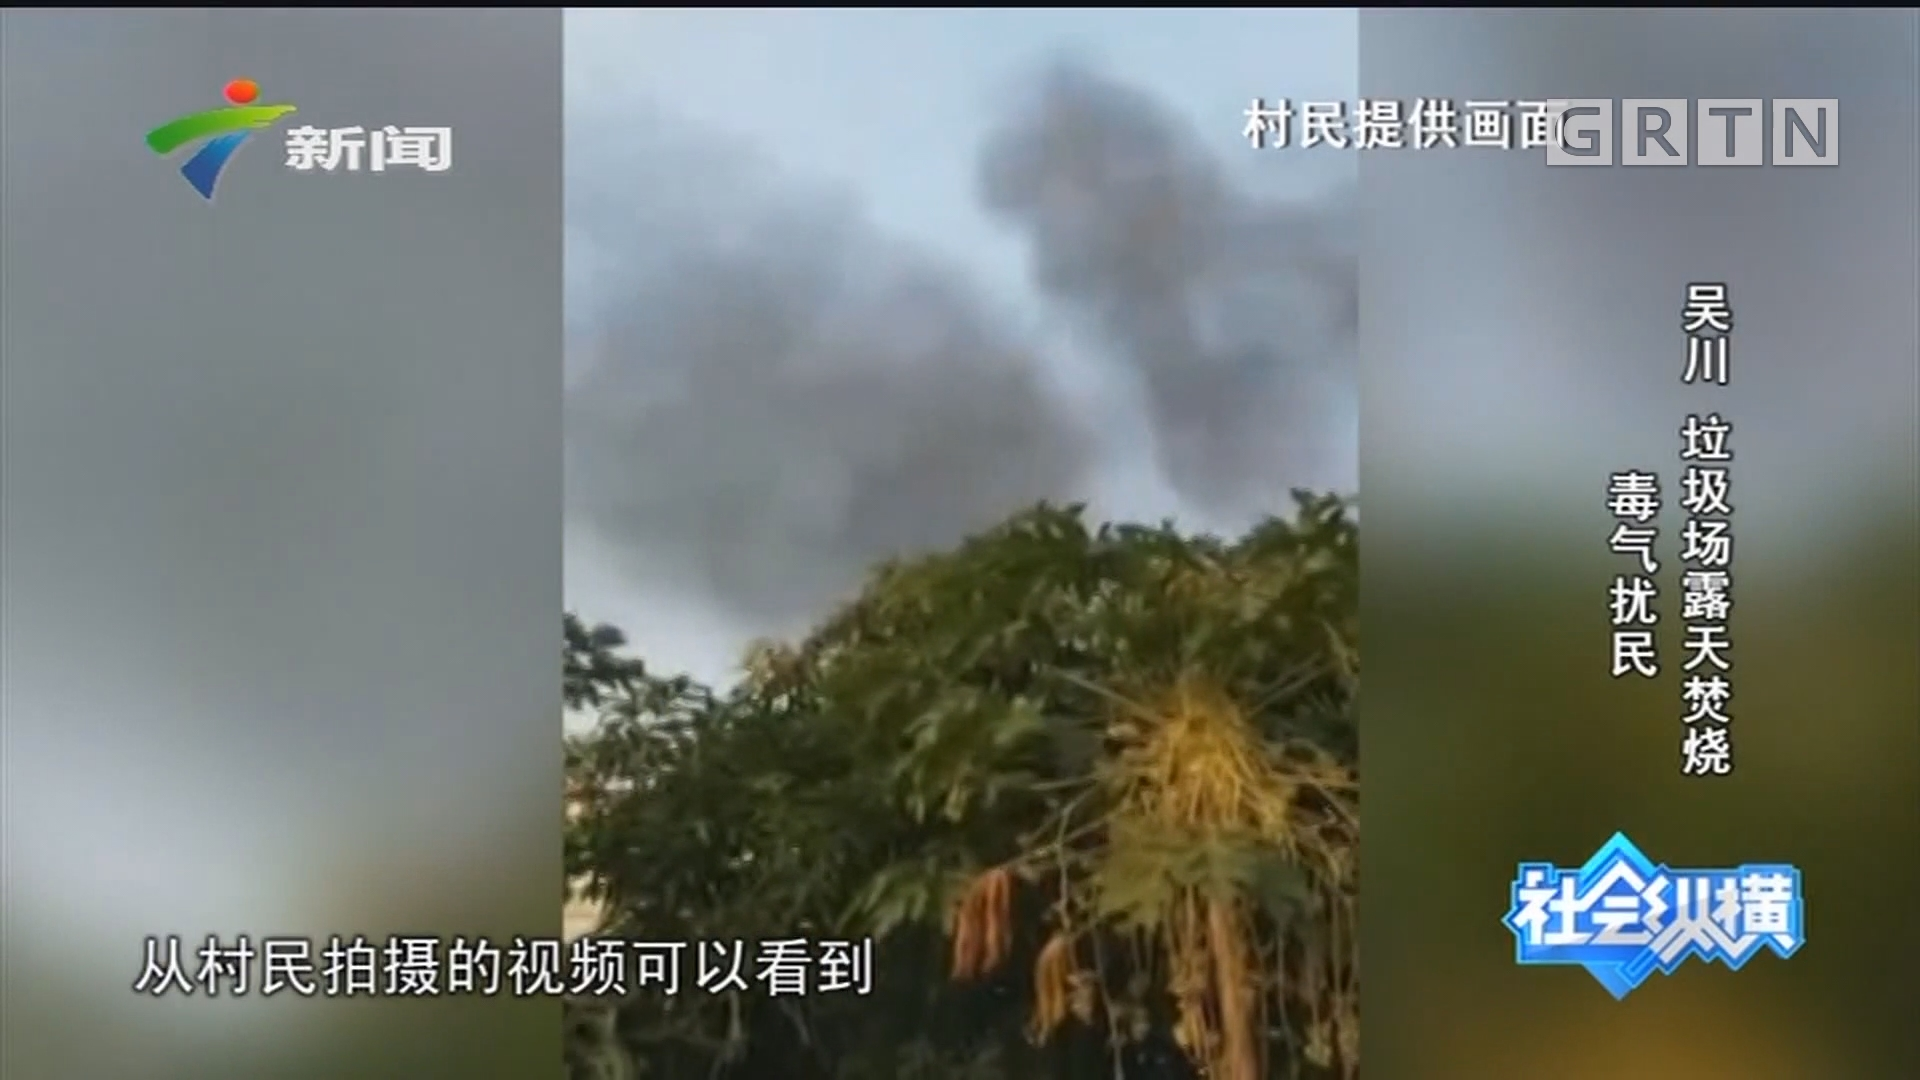 [HD][2019-11-06]社会纵横:吴川 垃圾场露天焚烧 毒气扰民